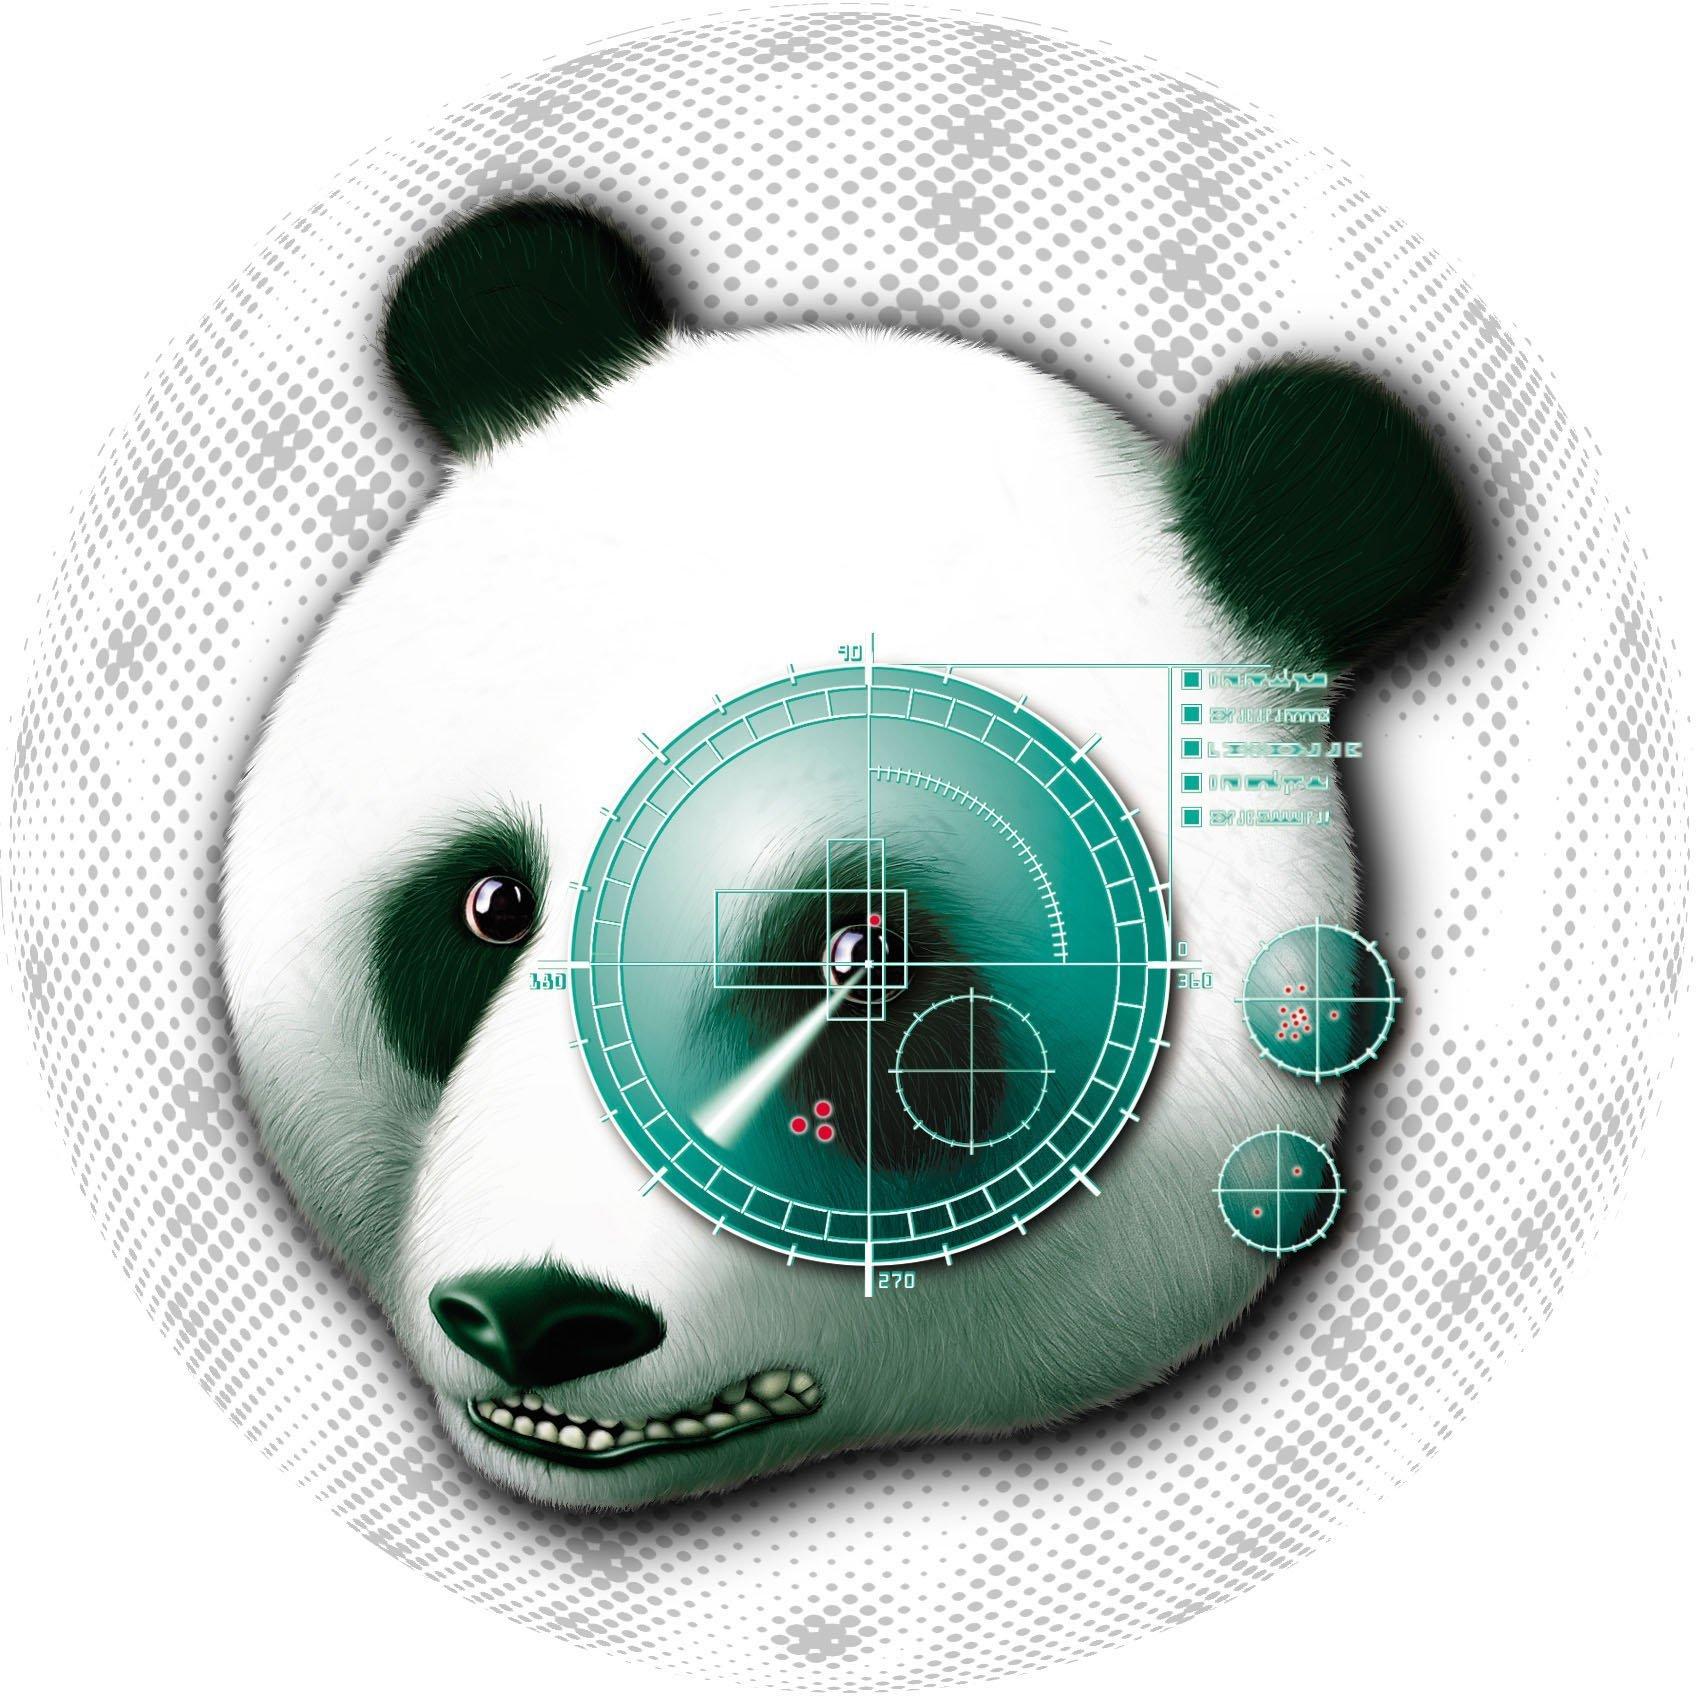 Panda Cloud Antivirus бесплатный облачный антивирус